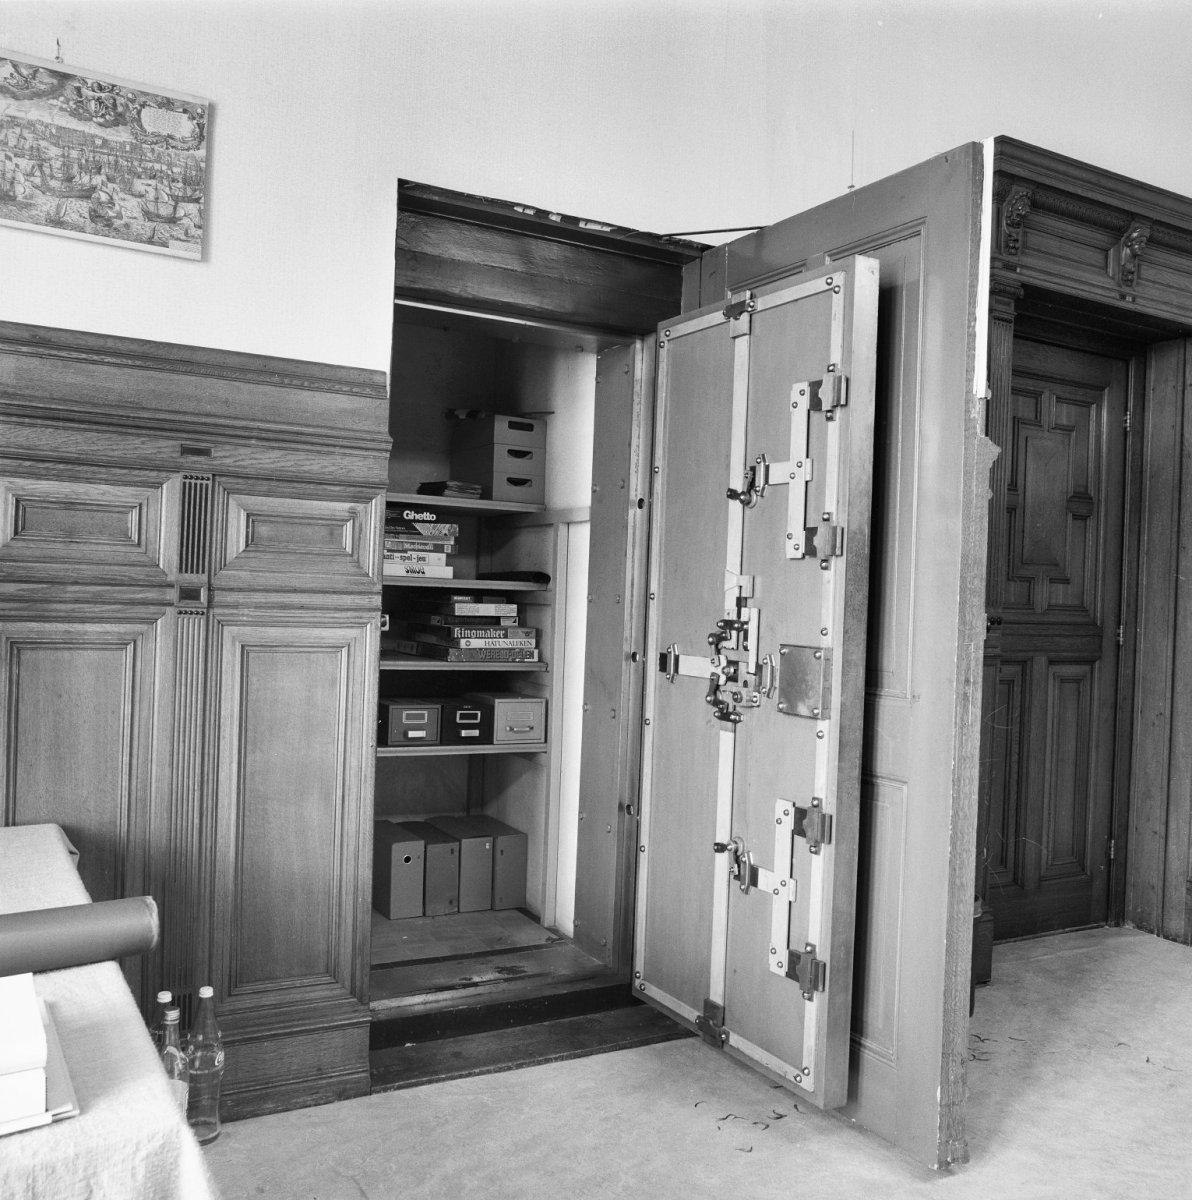 File:Interieur, kluis in huiskamer begane grond - Leiden - 20137350 ...